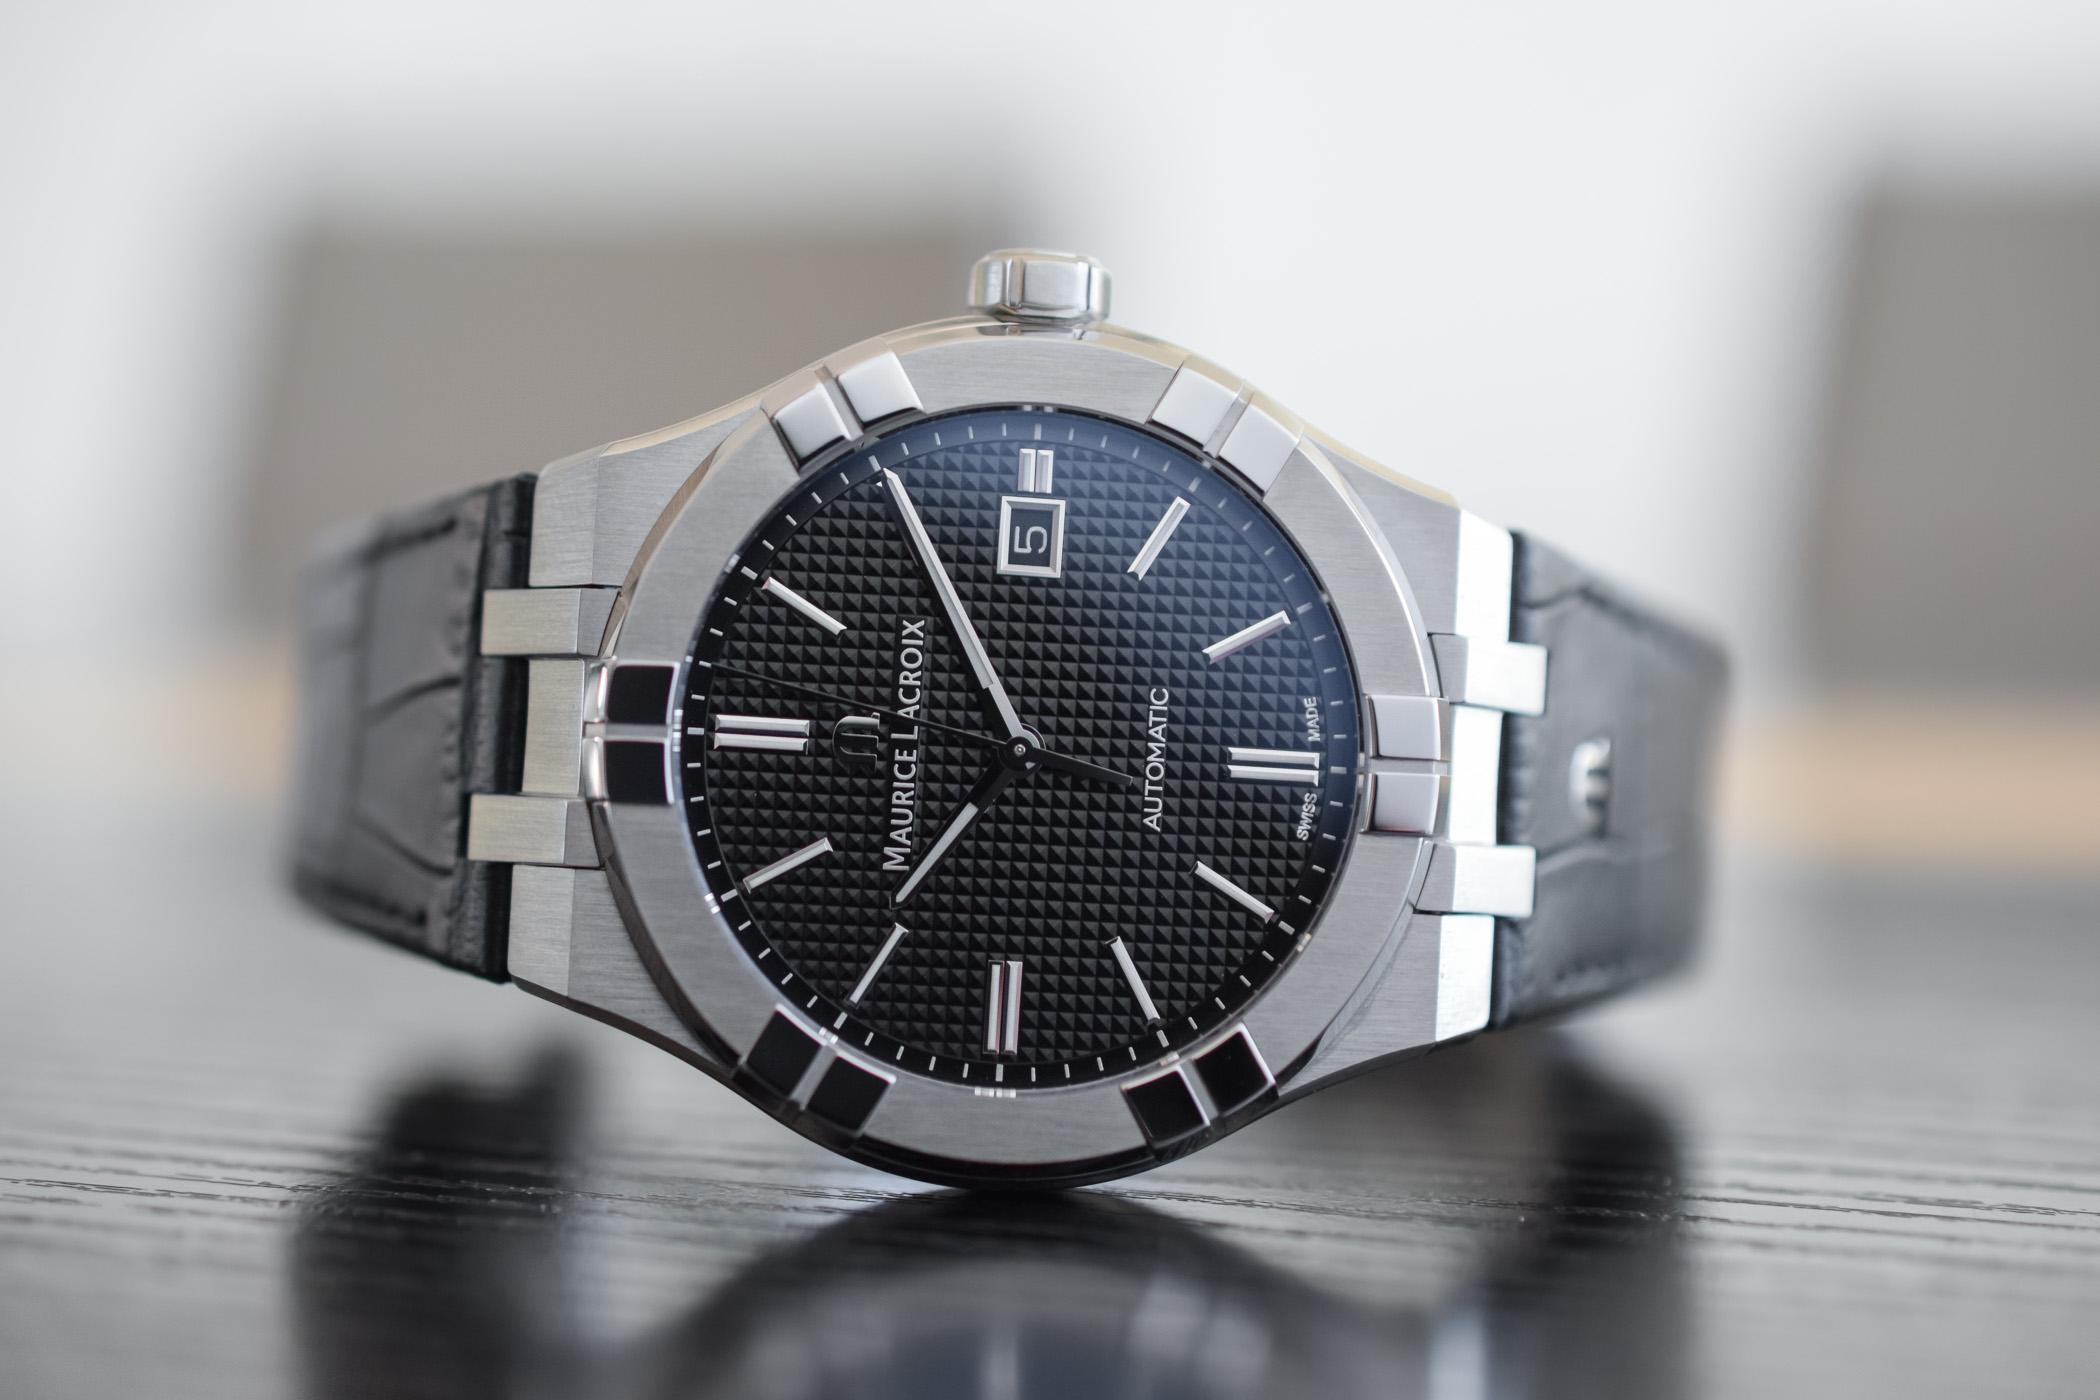 Maurice Lacroix Aikon Automatic chronograph - Baselworld 2018 - 12